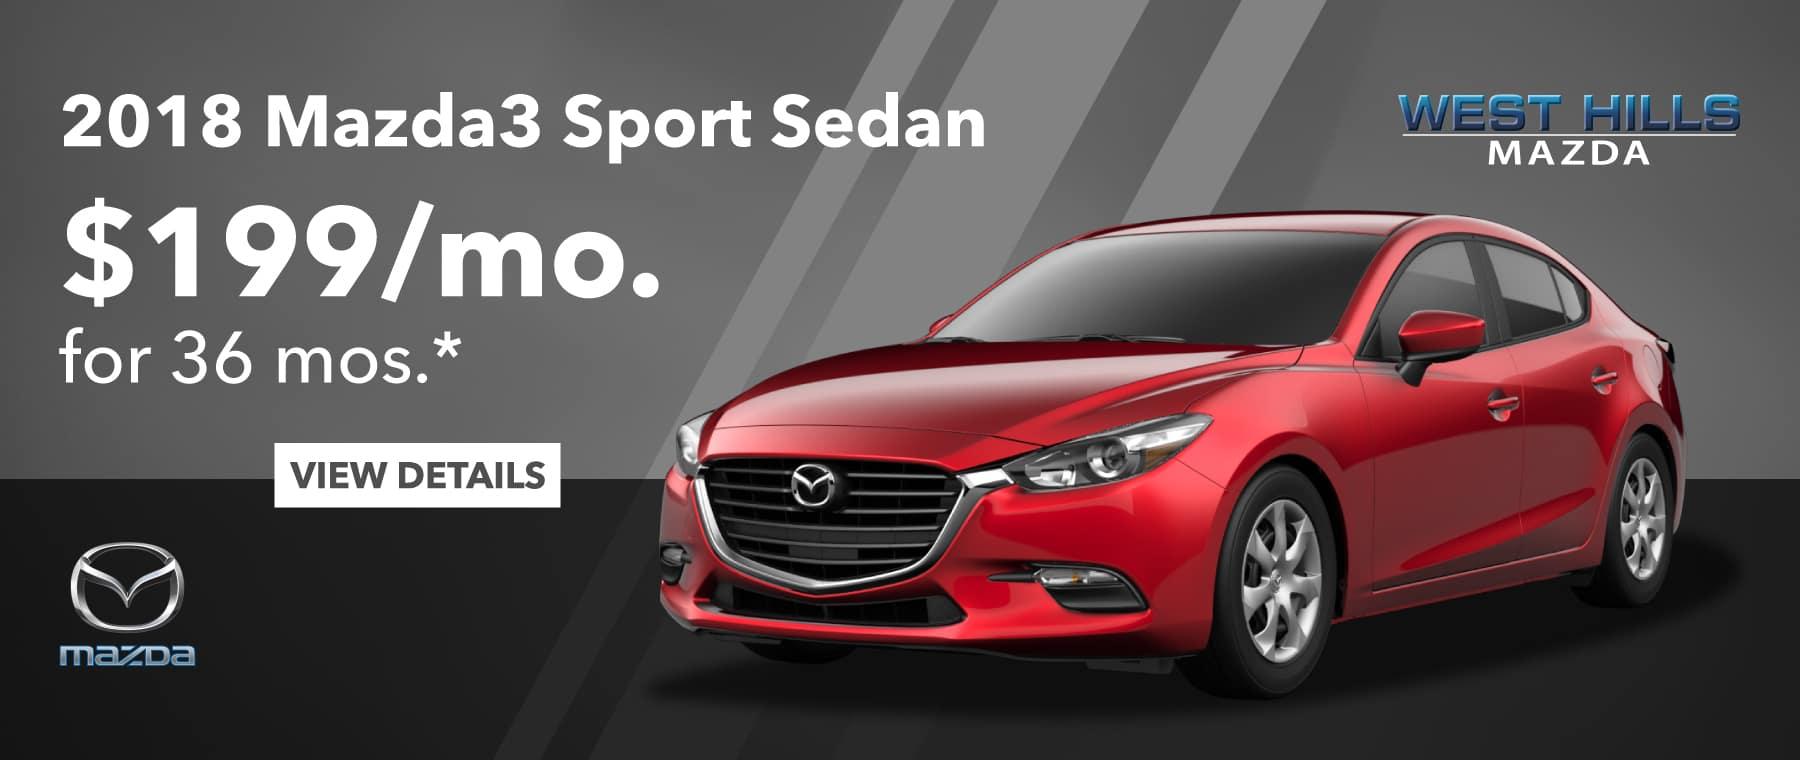 2018 Mazda3 Sport Sedan $199/mo. For 36 mos.*